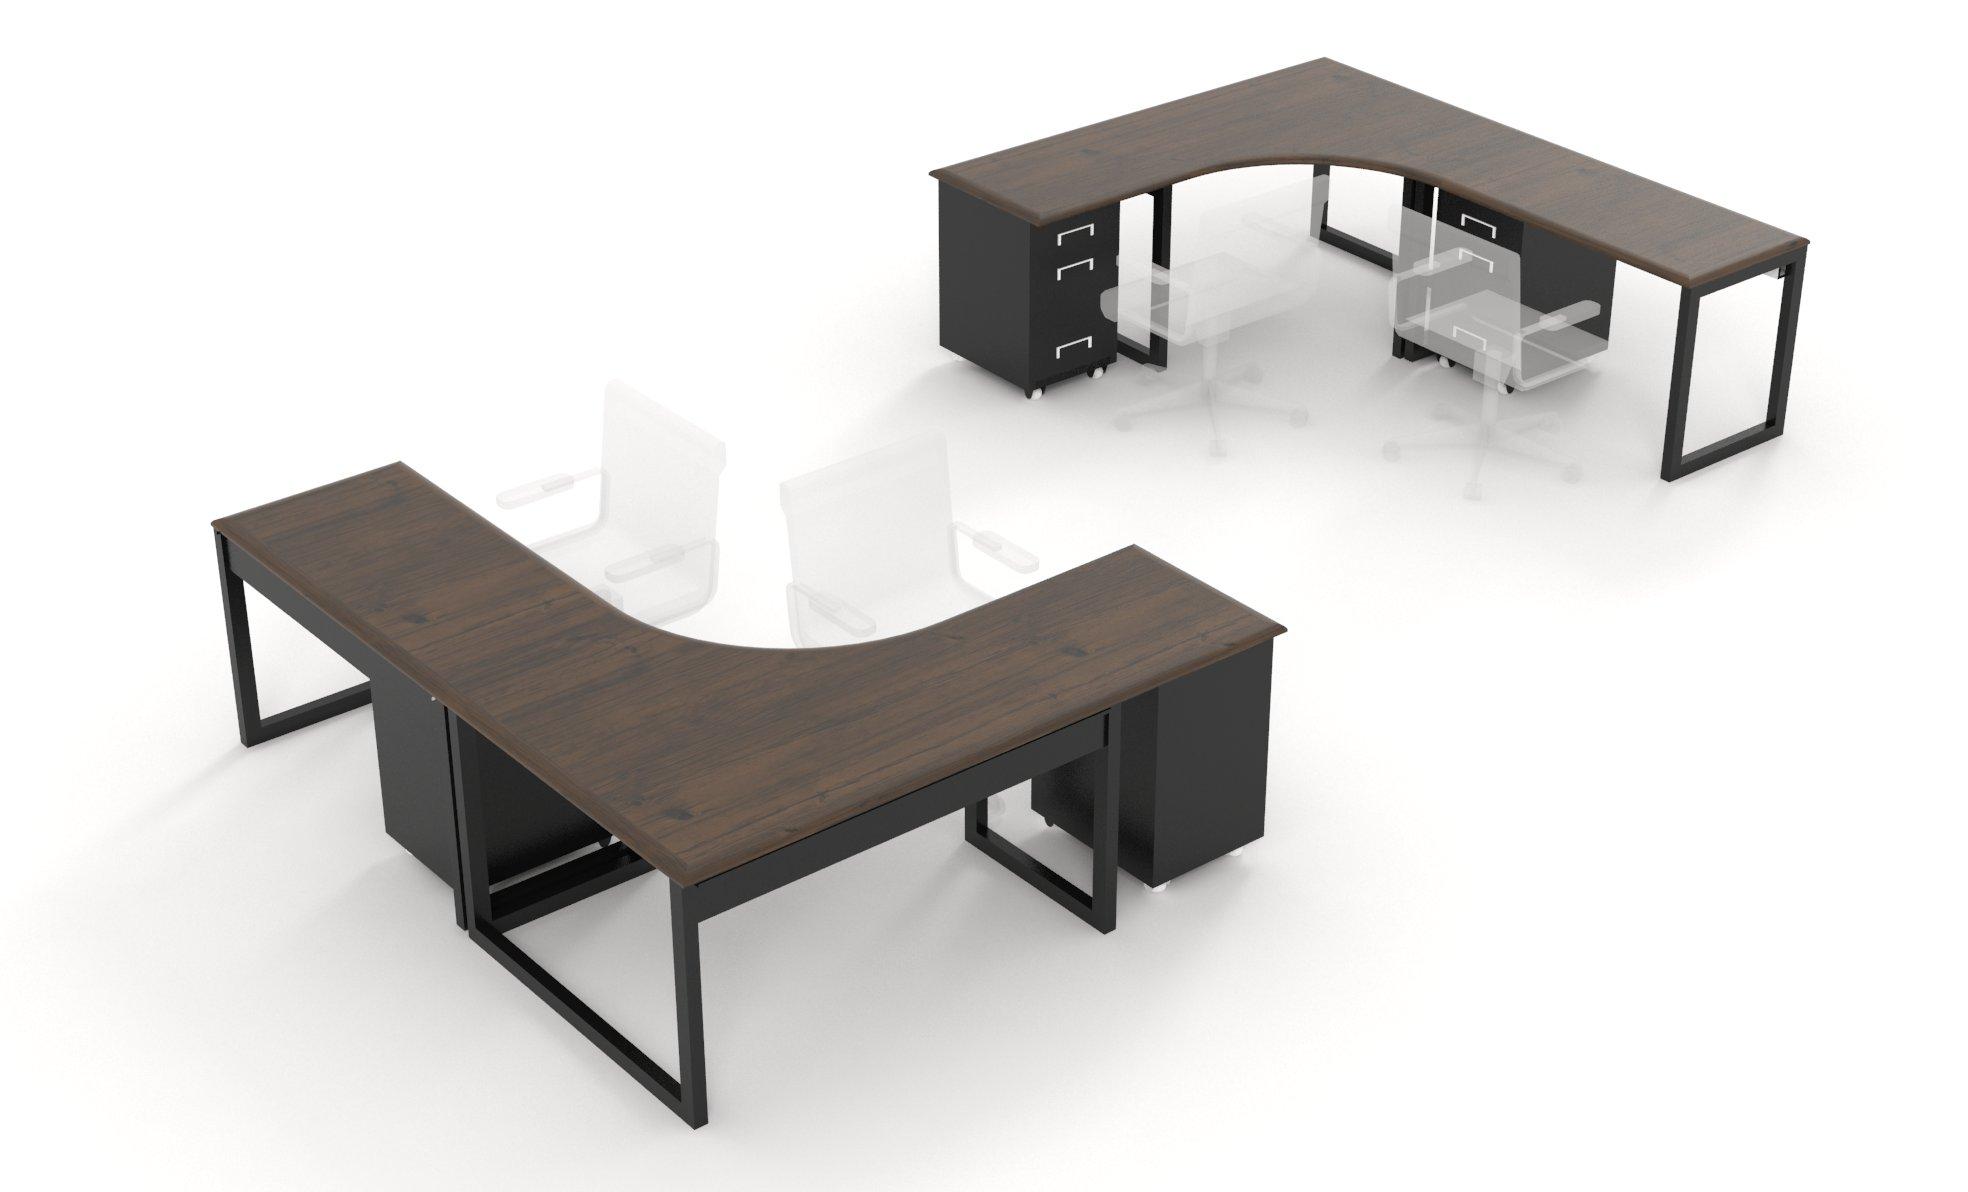 Productos Muebles Modulares Metal Mobil Costa Rica # Muebles Registrables